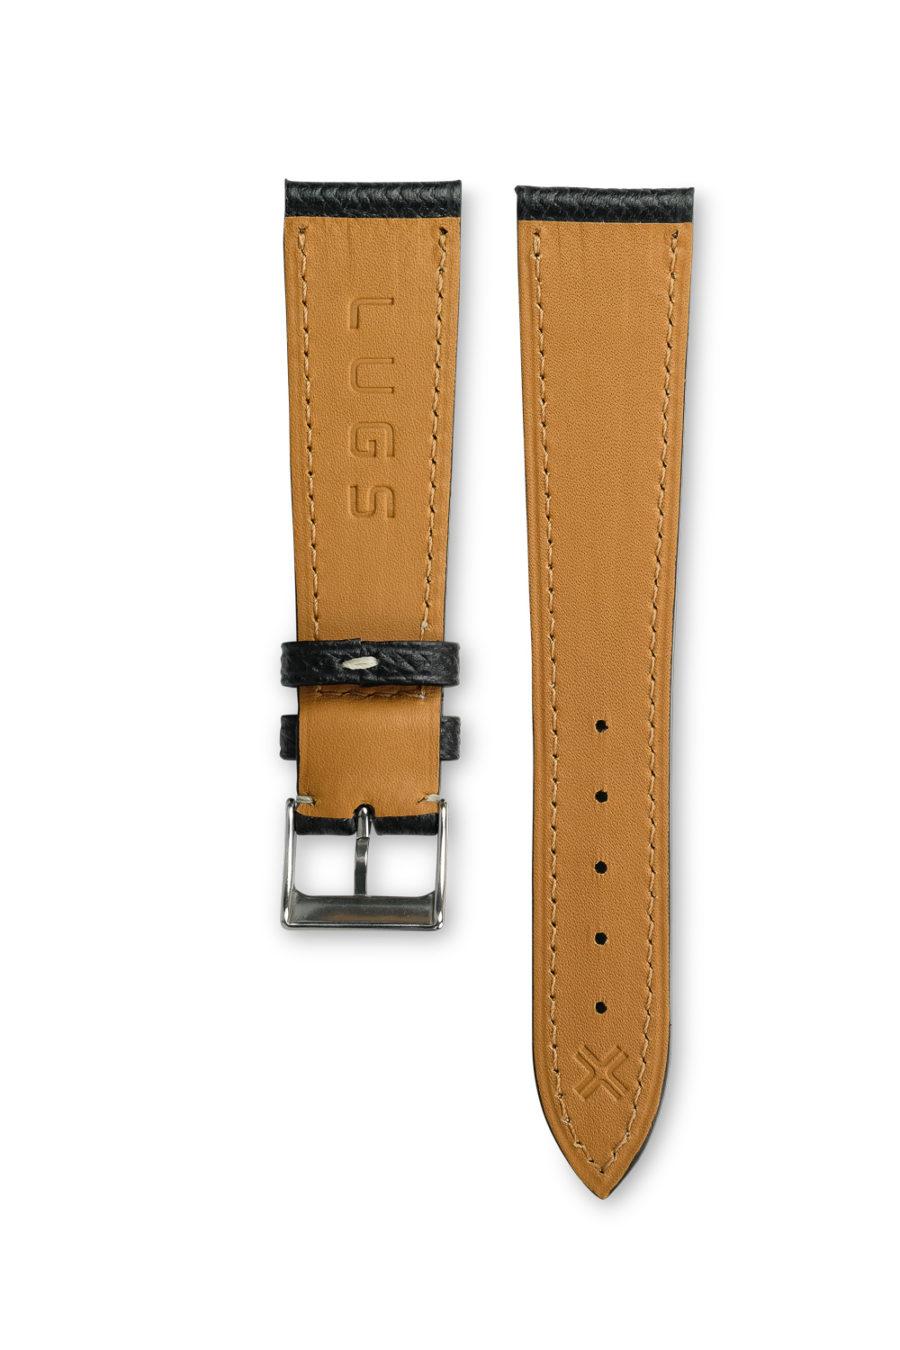 Grained Classic Barenia deep black leather watch strap - cream stitching - LUGS brand